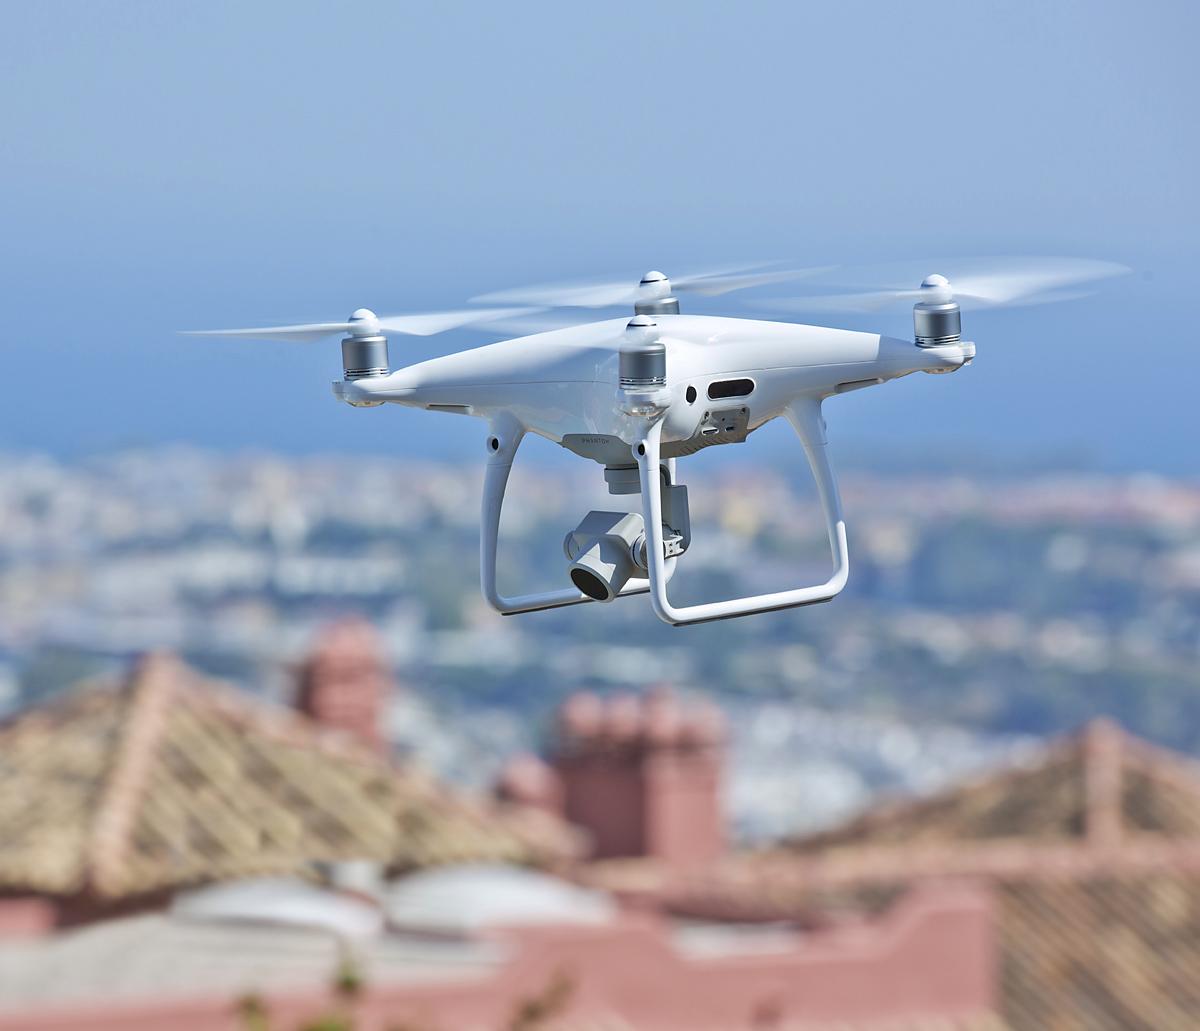 Drone fines in Spain,Drone Photography, Marbella Done Pilot, Licensed Drone Operator, DJI Marbella, Drone Cameraman, Drone Operator Marbella